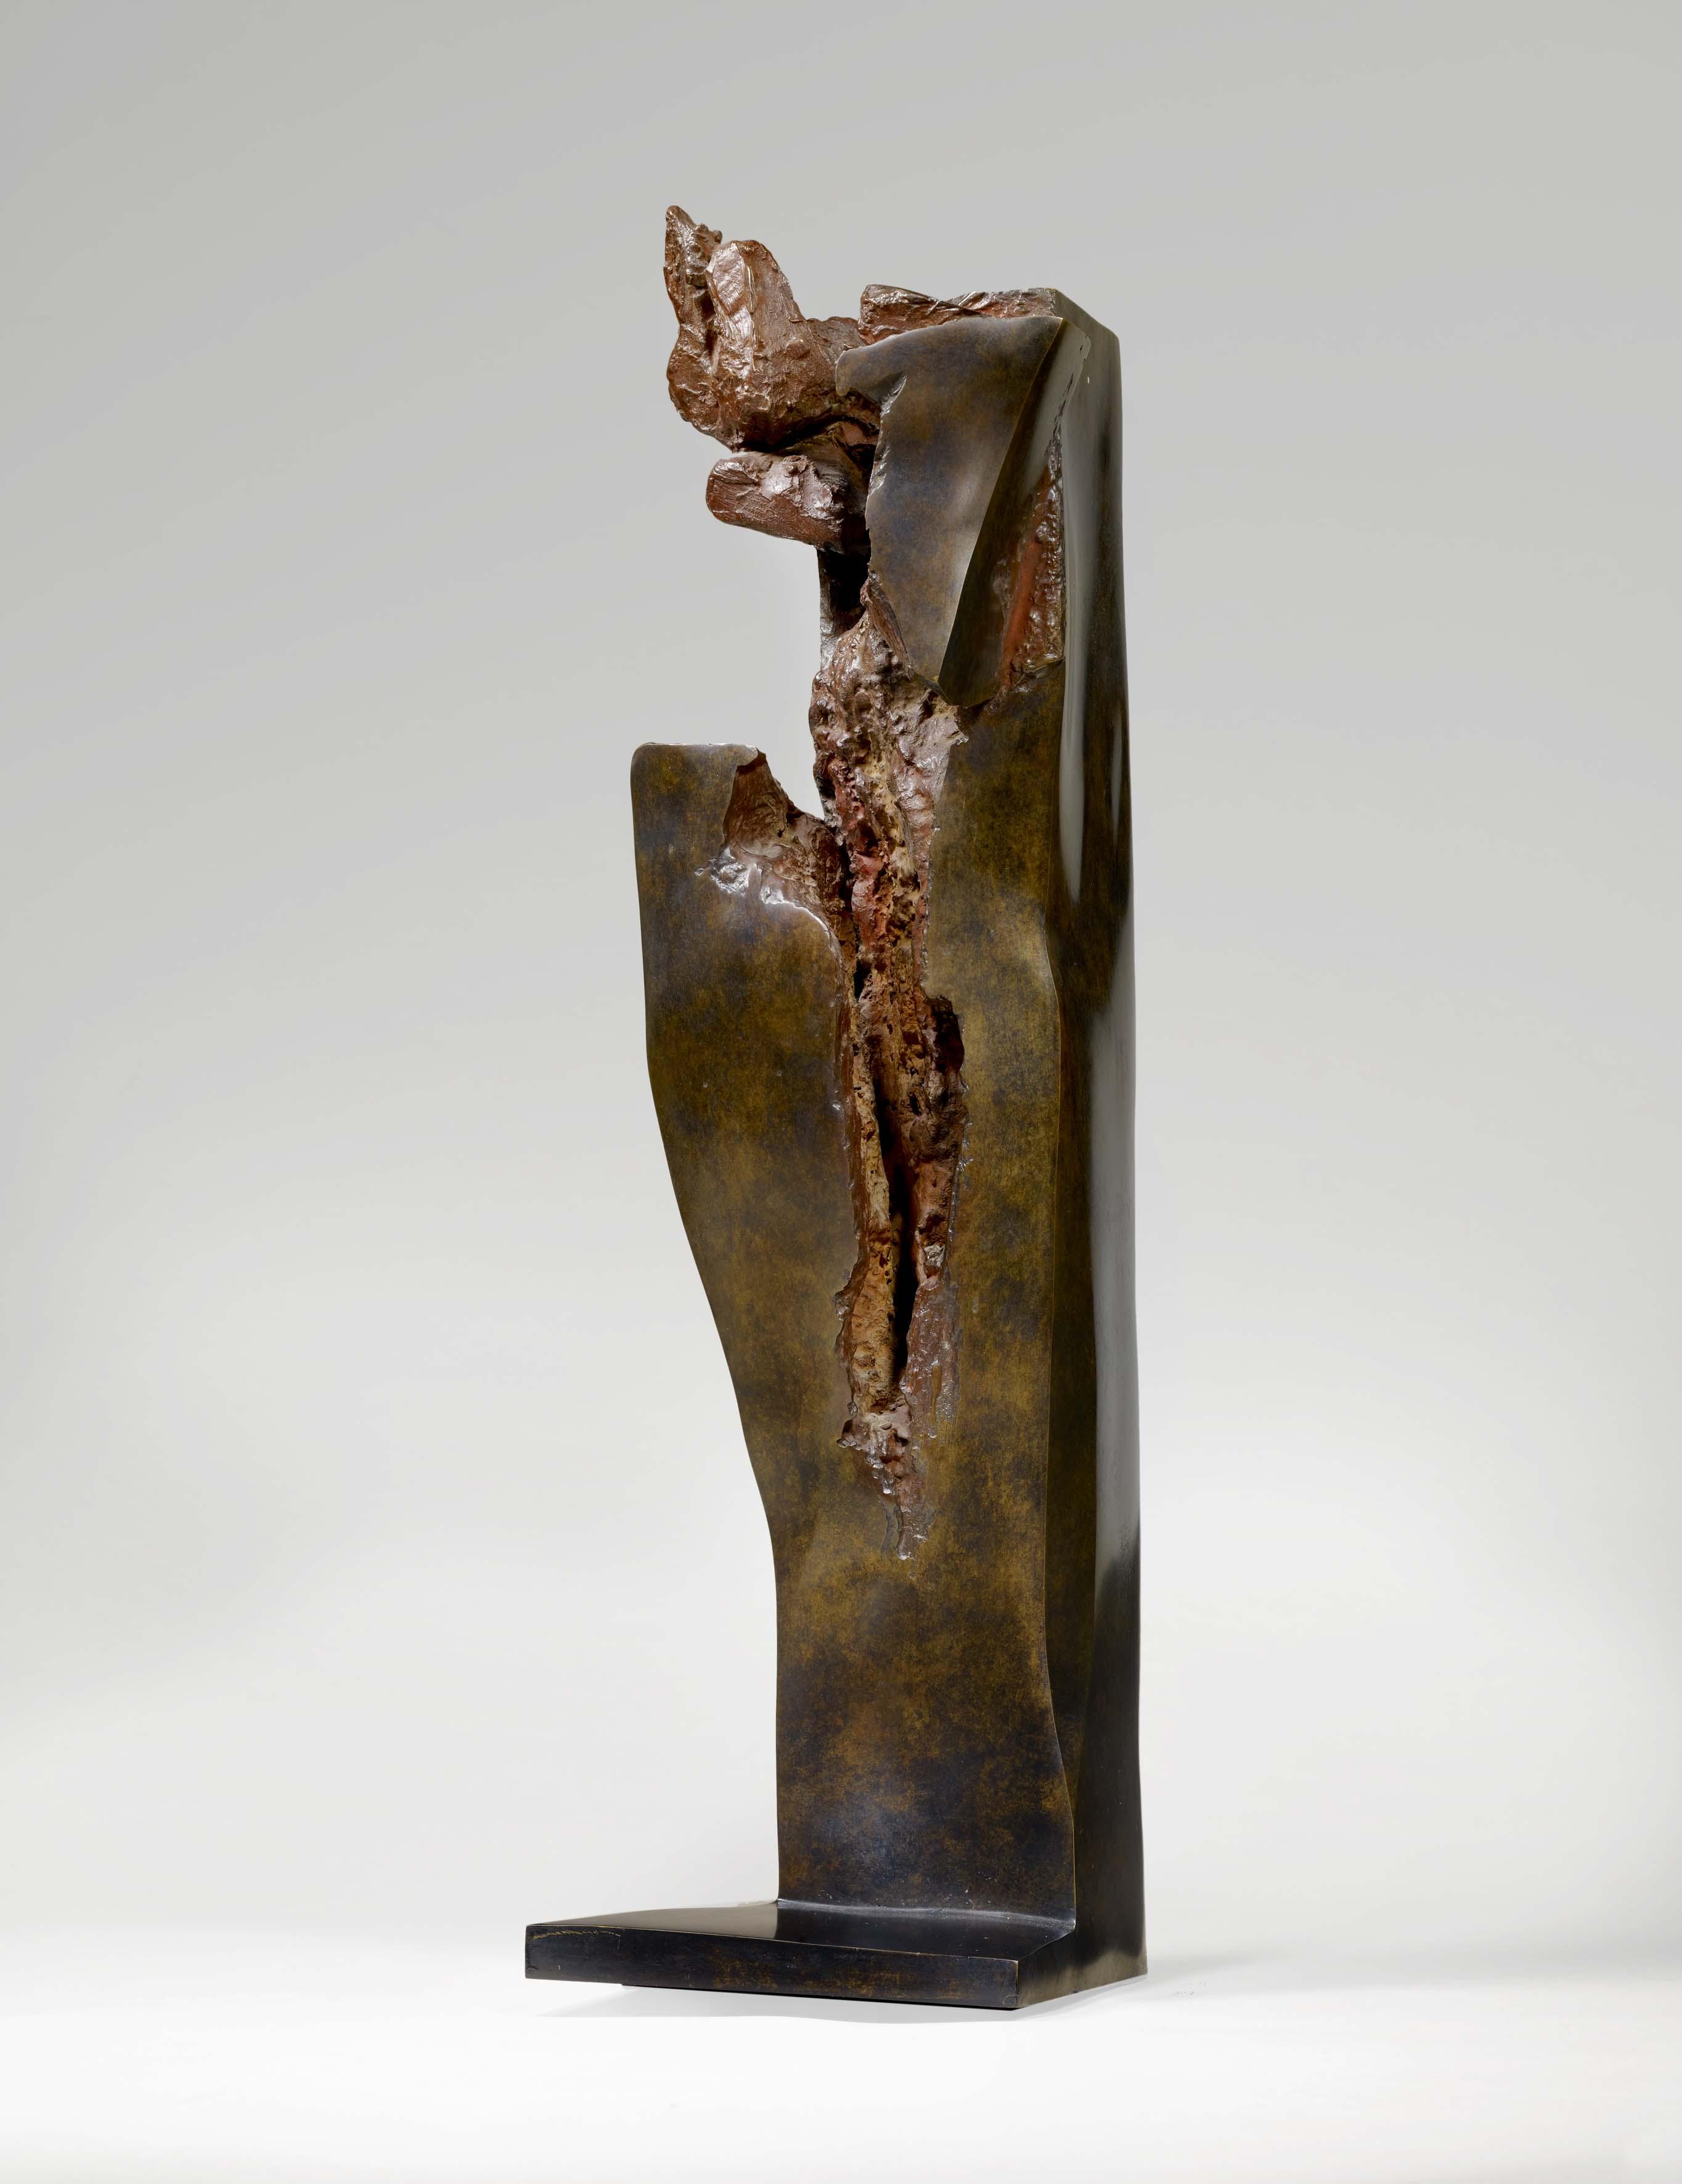 Brisure, 2000 - 2003, 69 x 20 x 18 cm